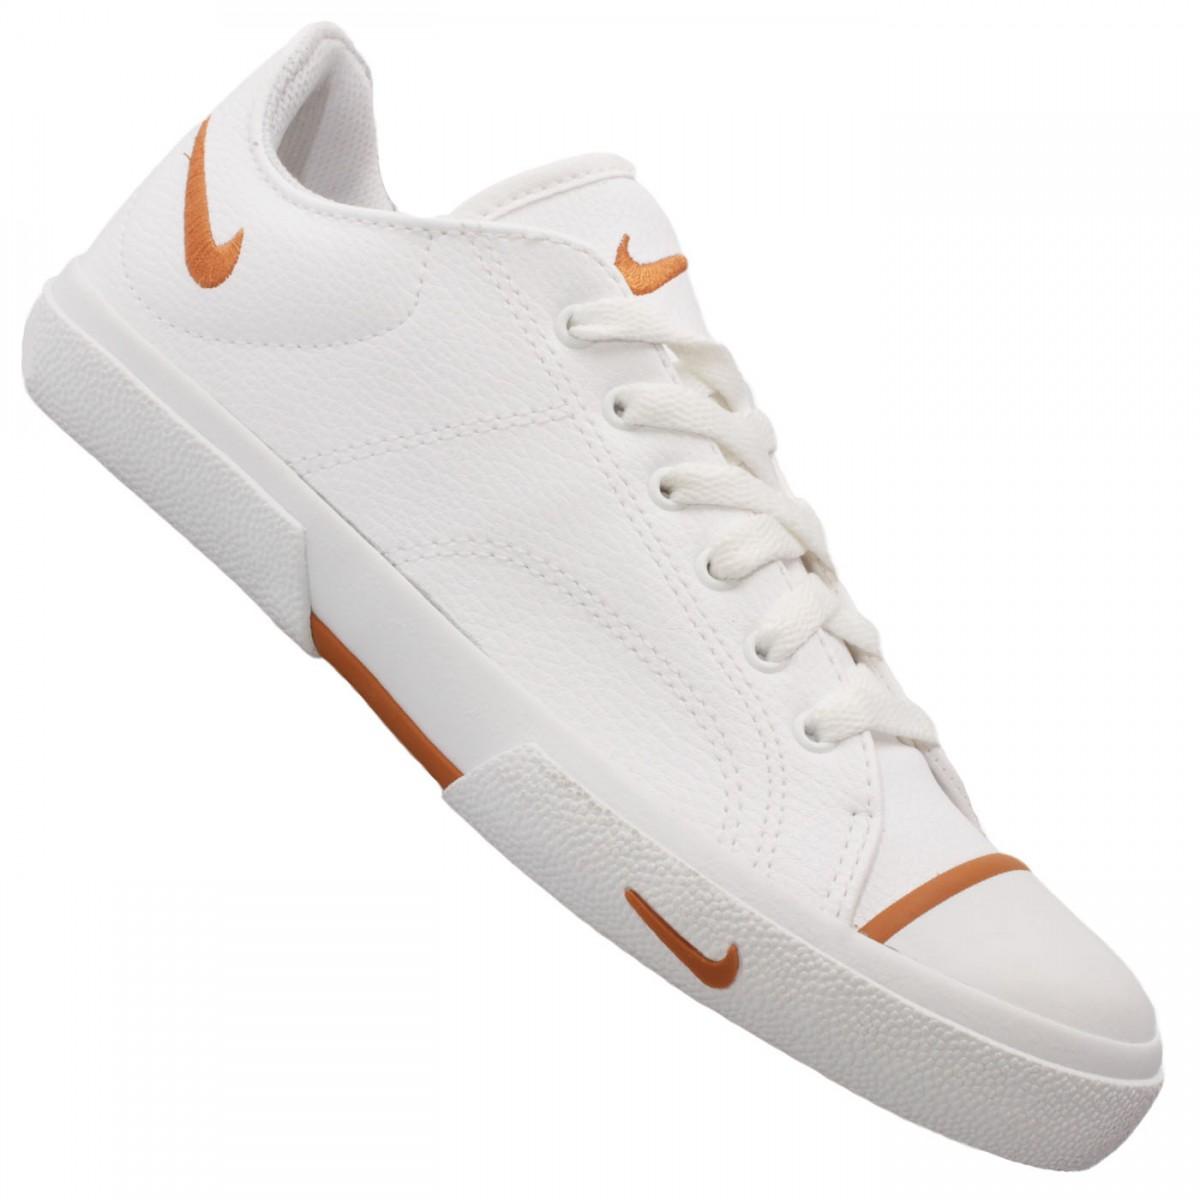 0a9efdc07ce Tênis Nike Biscuit SL WMNS